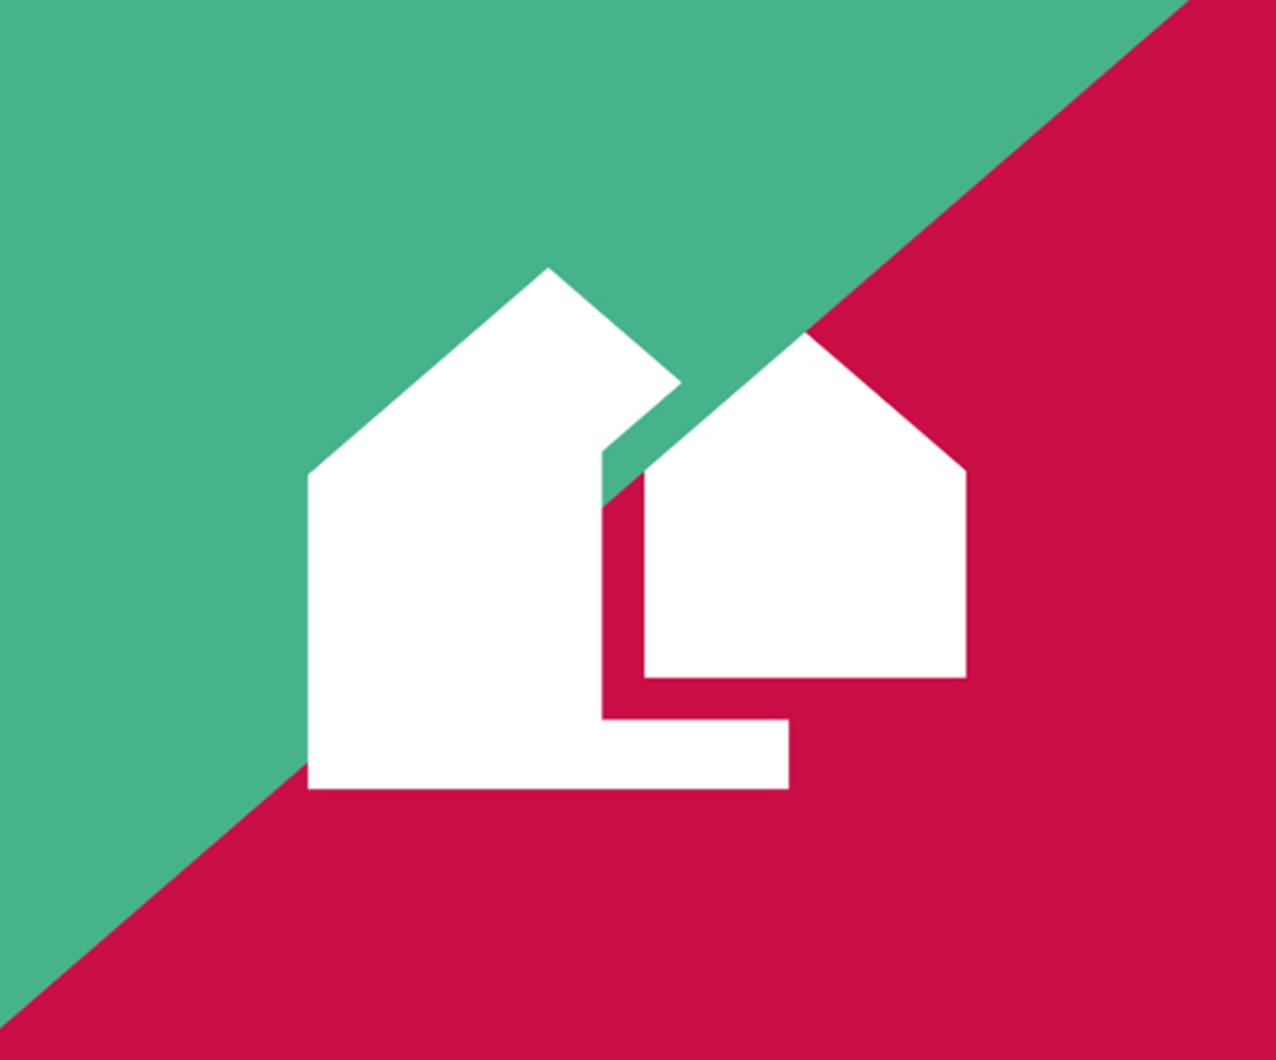 Central Urban Living HMO Invest icon design